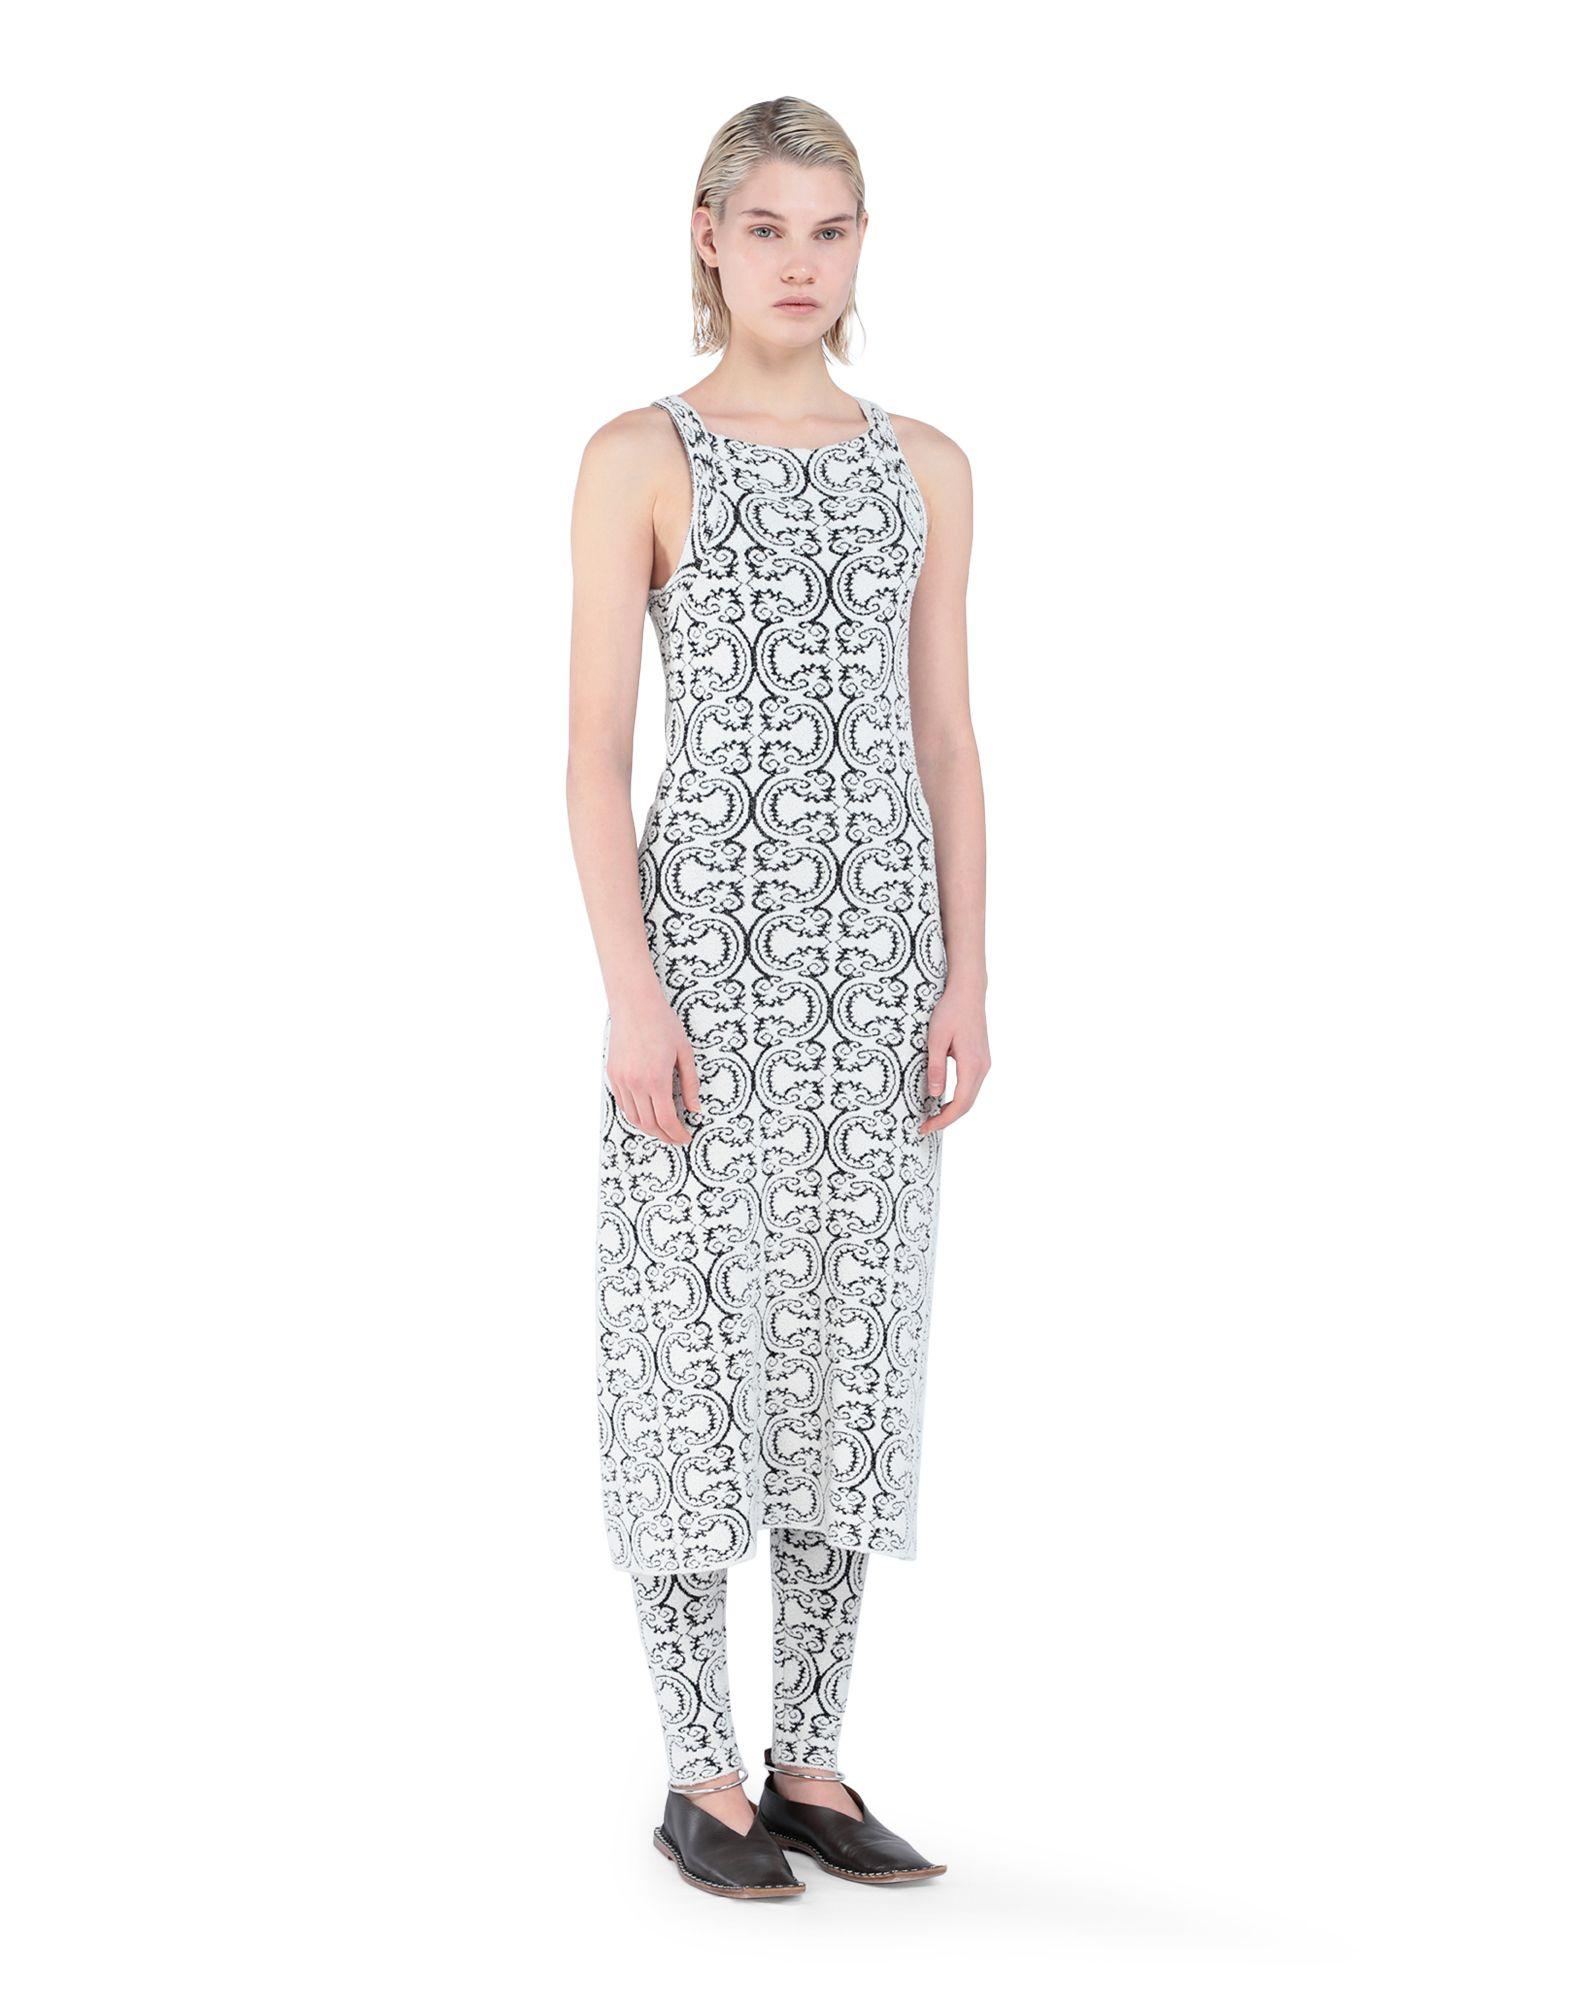 Leggings - JIL SANDER Online Store